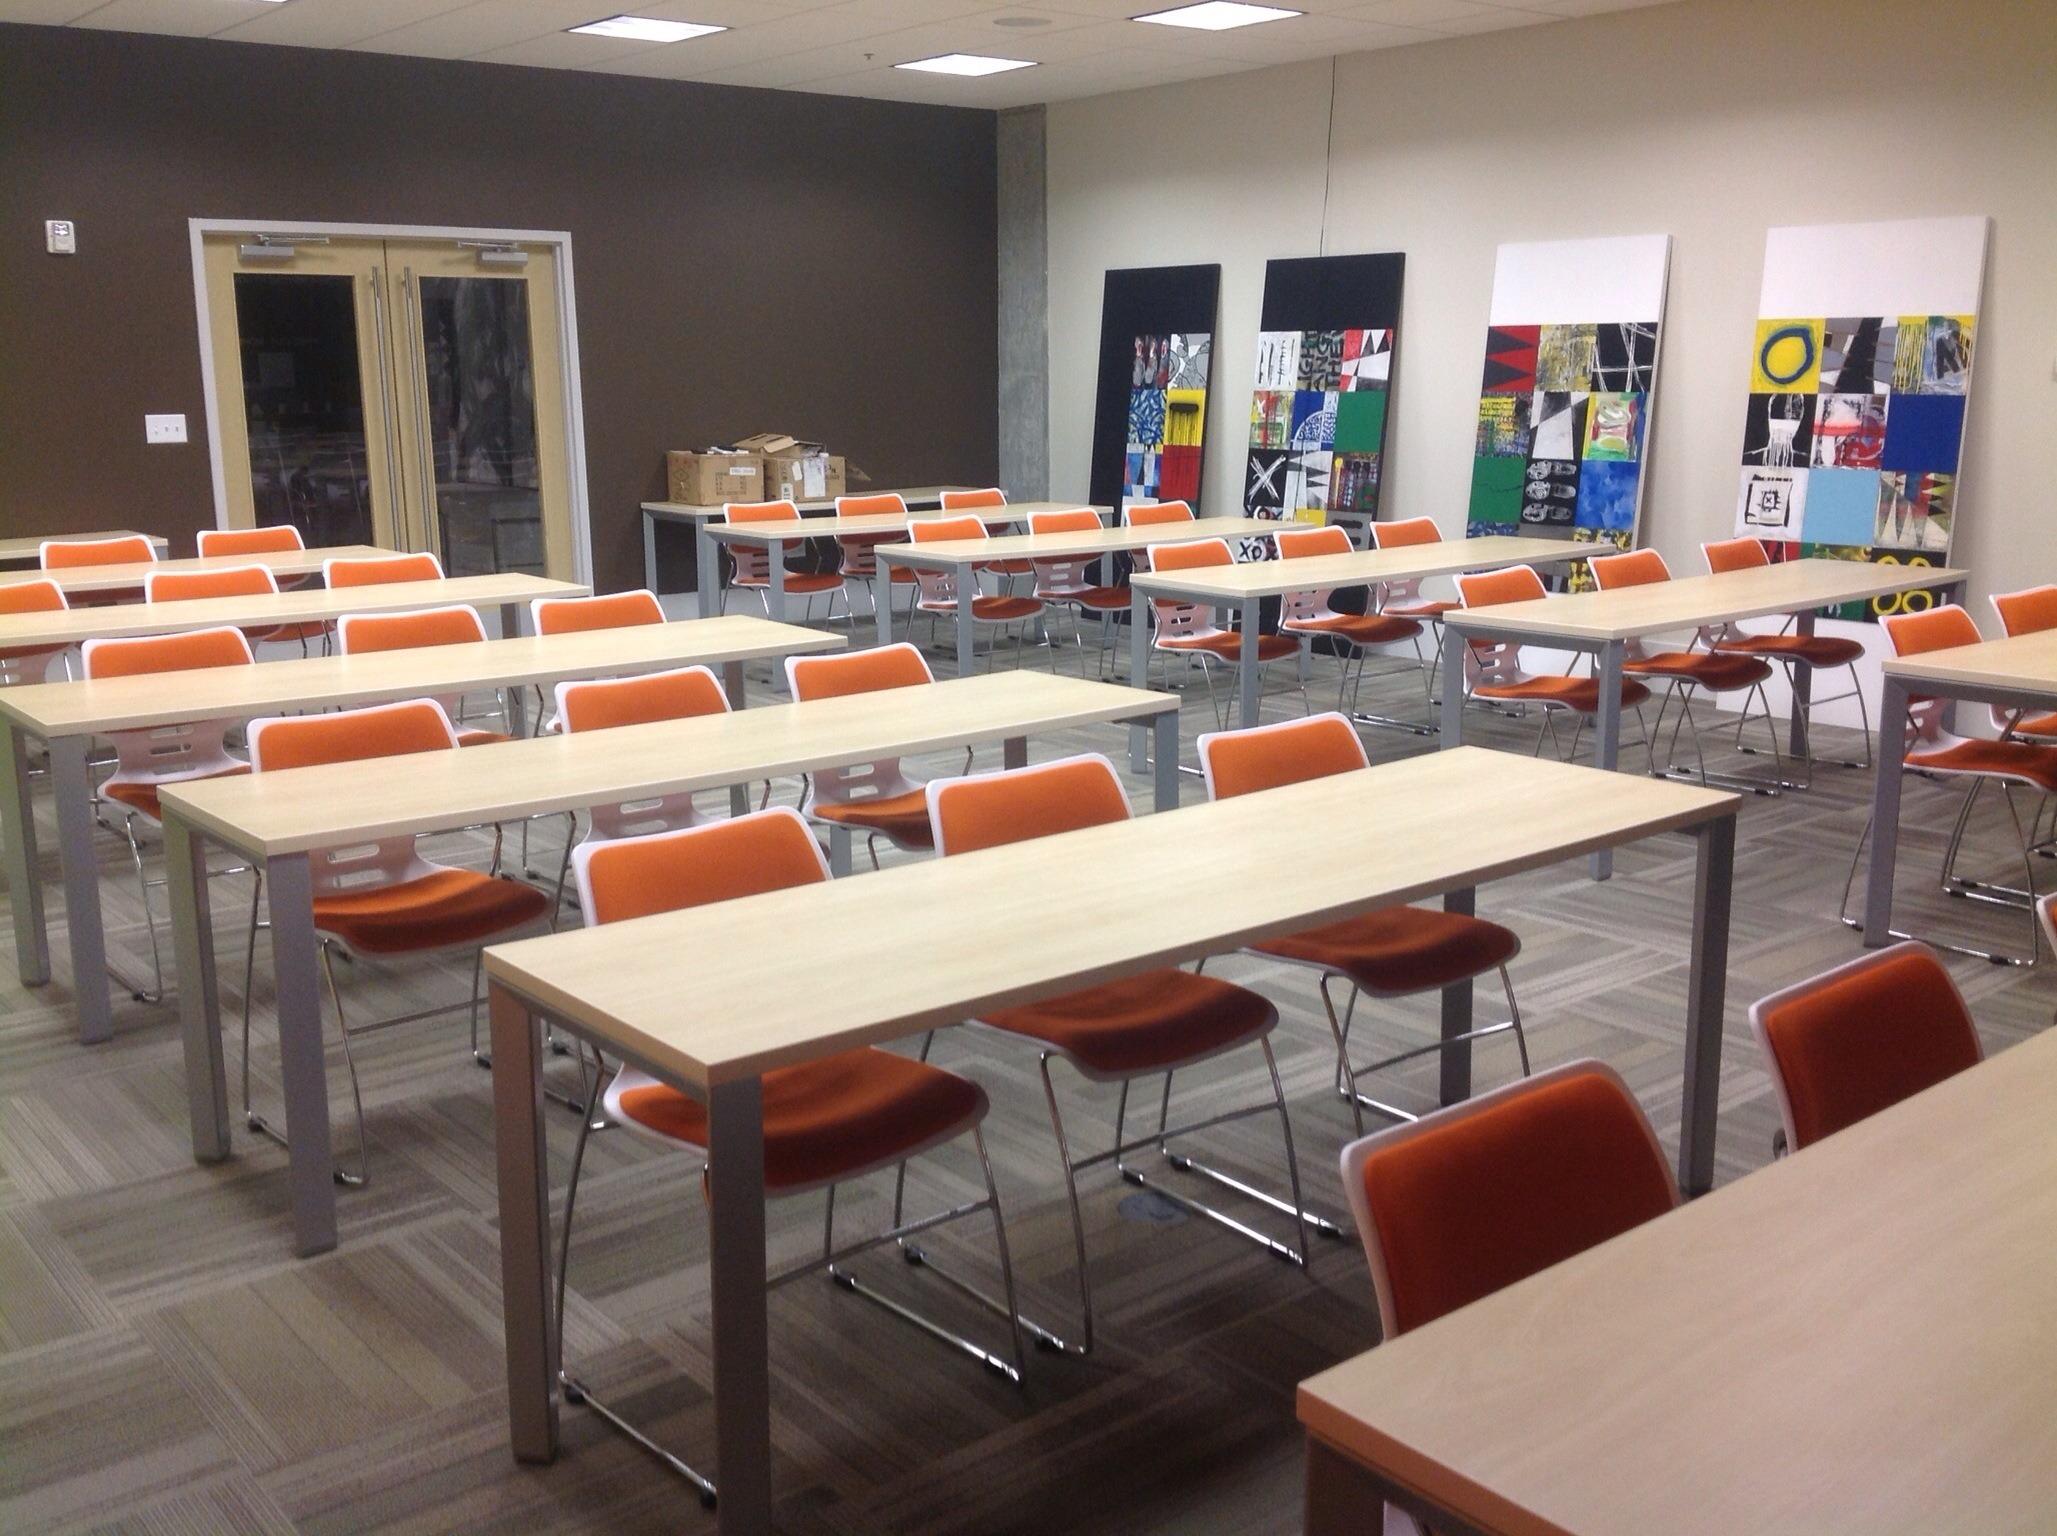 office cafeteria design. Restaurant Office Room Classroom Interior Design Conference Cafeteria Hall C